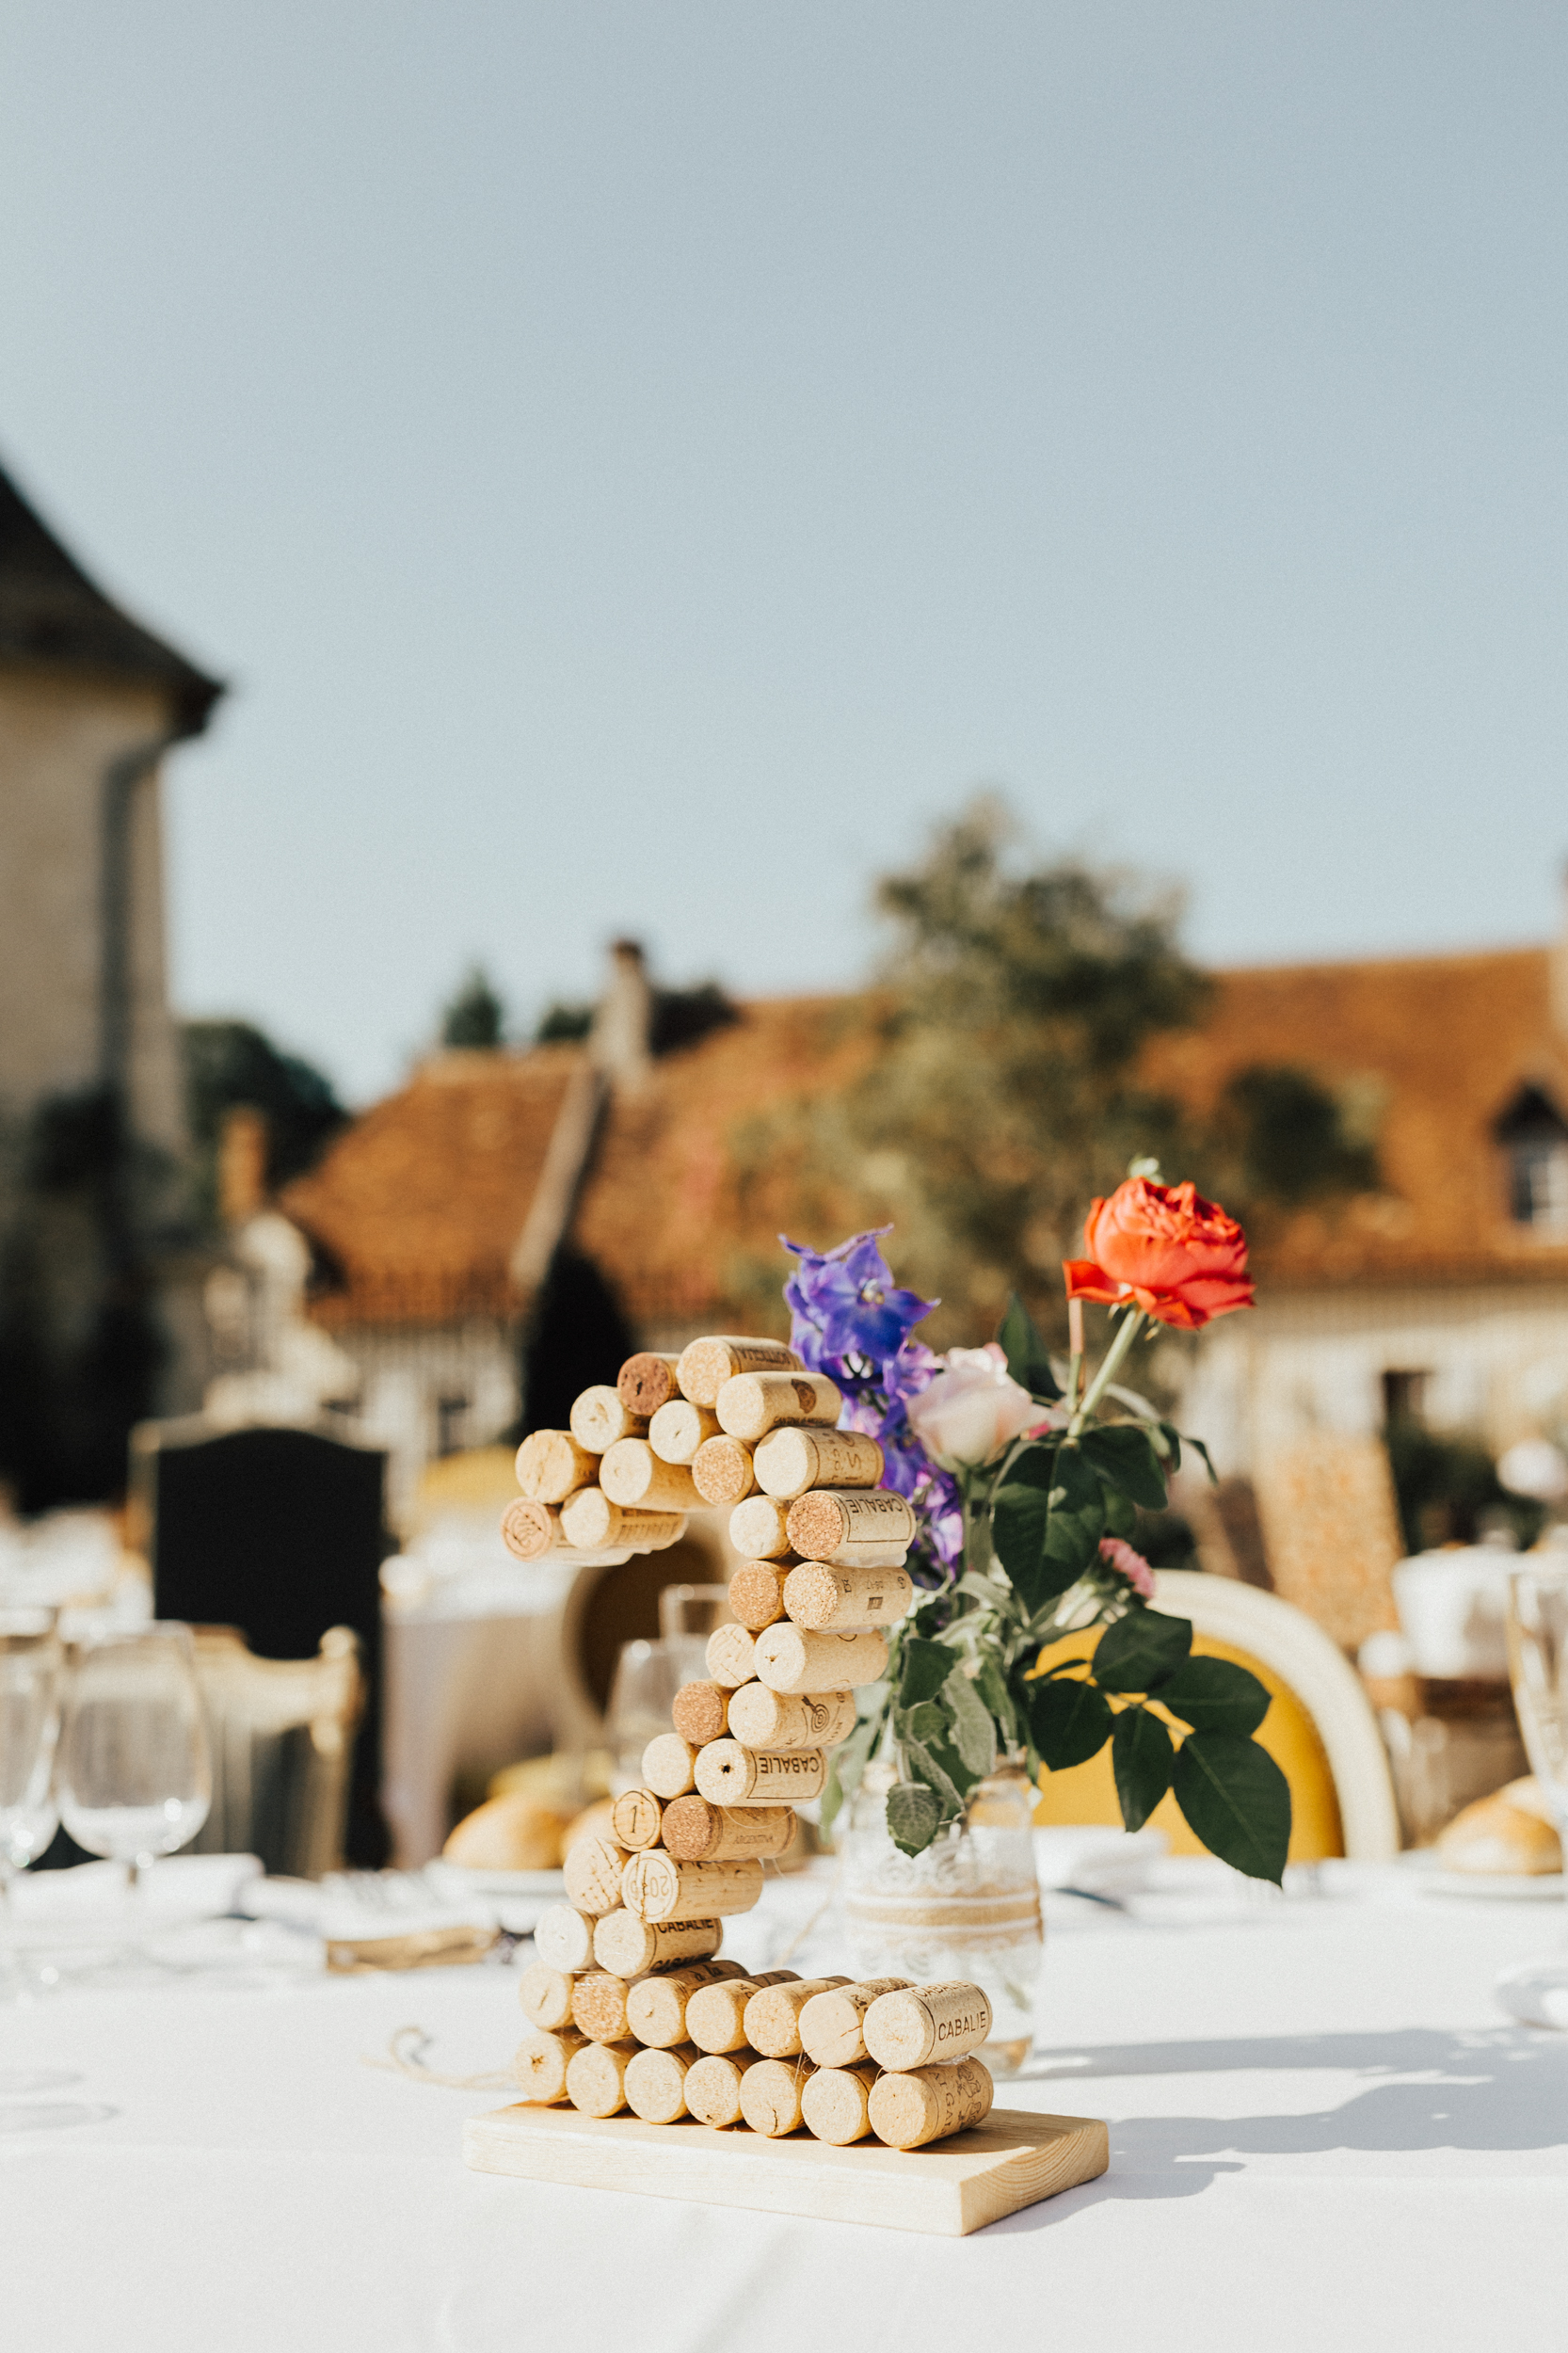 Amy-Zac-Destination-Wedding-France-Manoir-Foulquetiere-Darina-Stoda-Photography-61.jpg